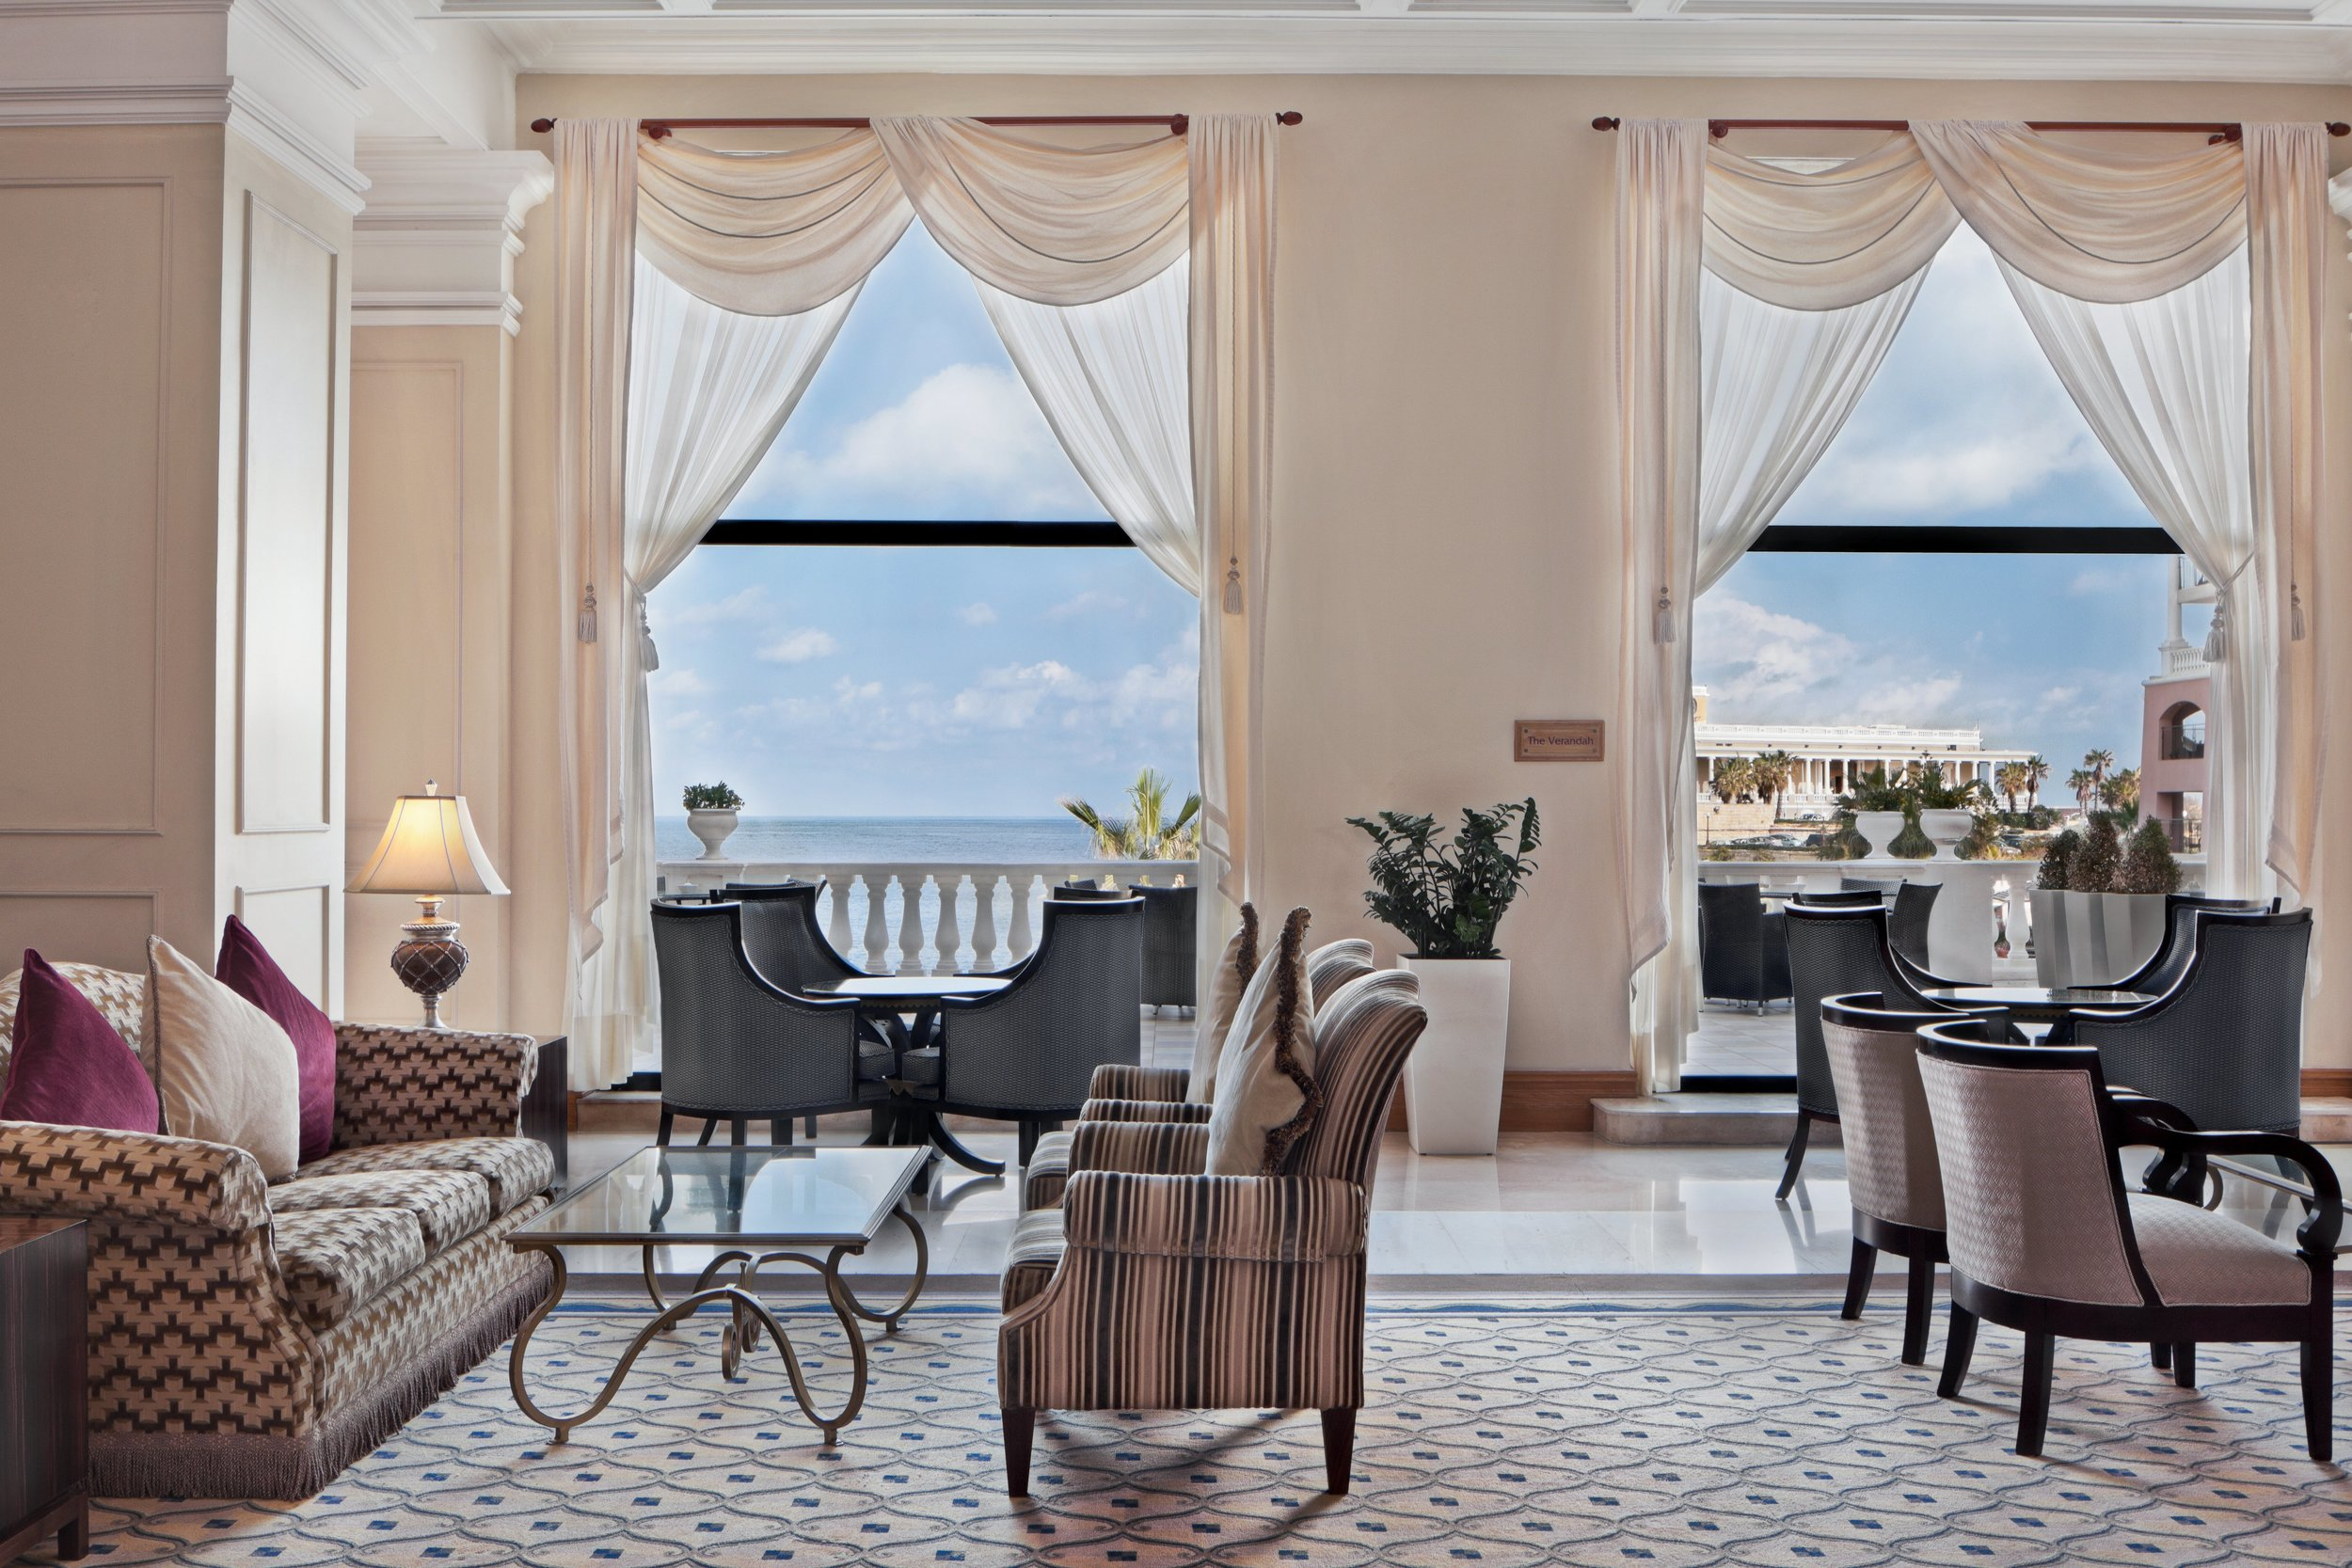 ORVM Lounge and Piano Bar views.jpg